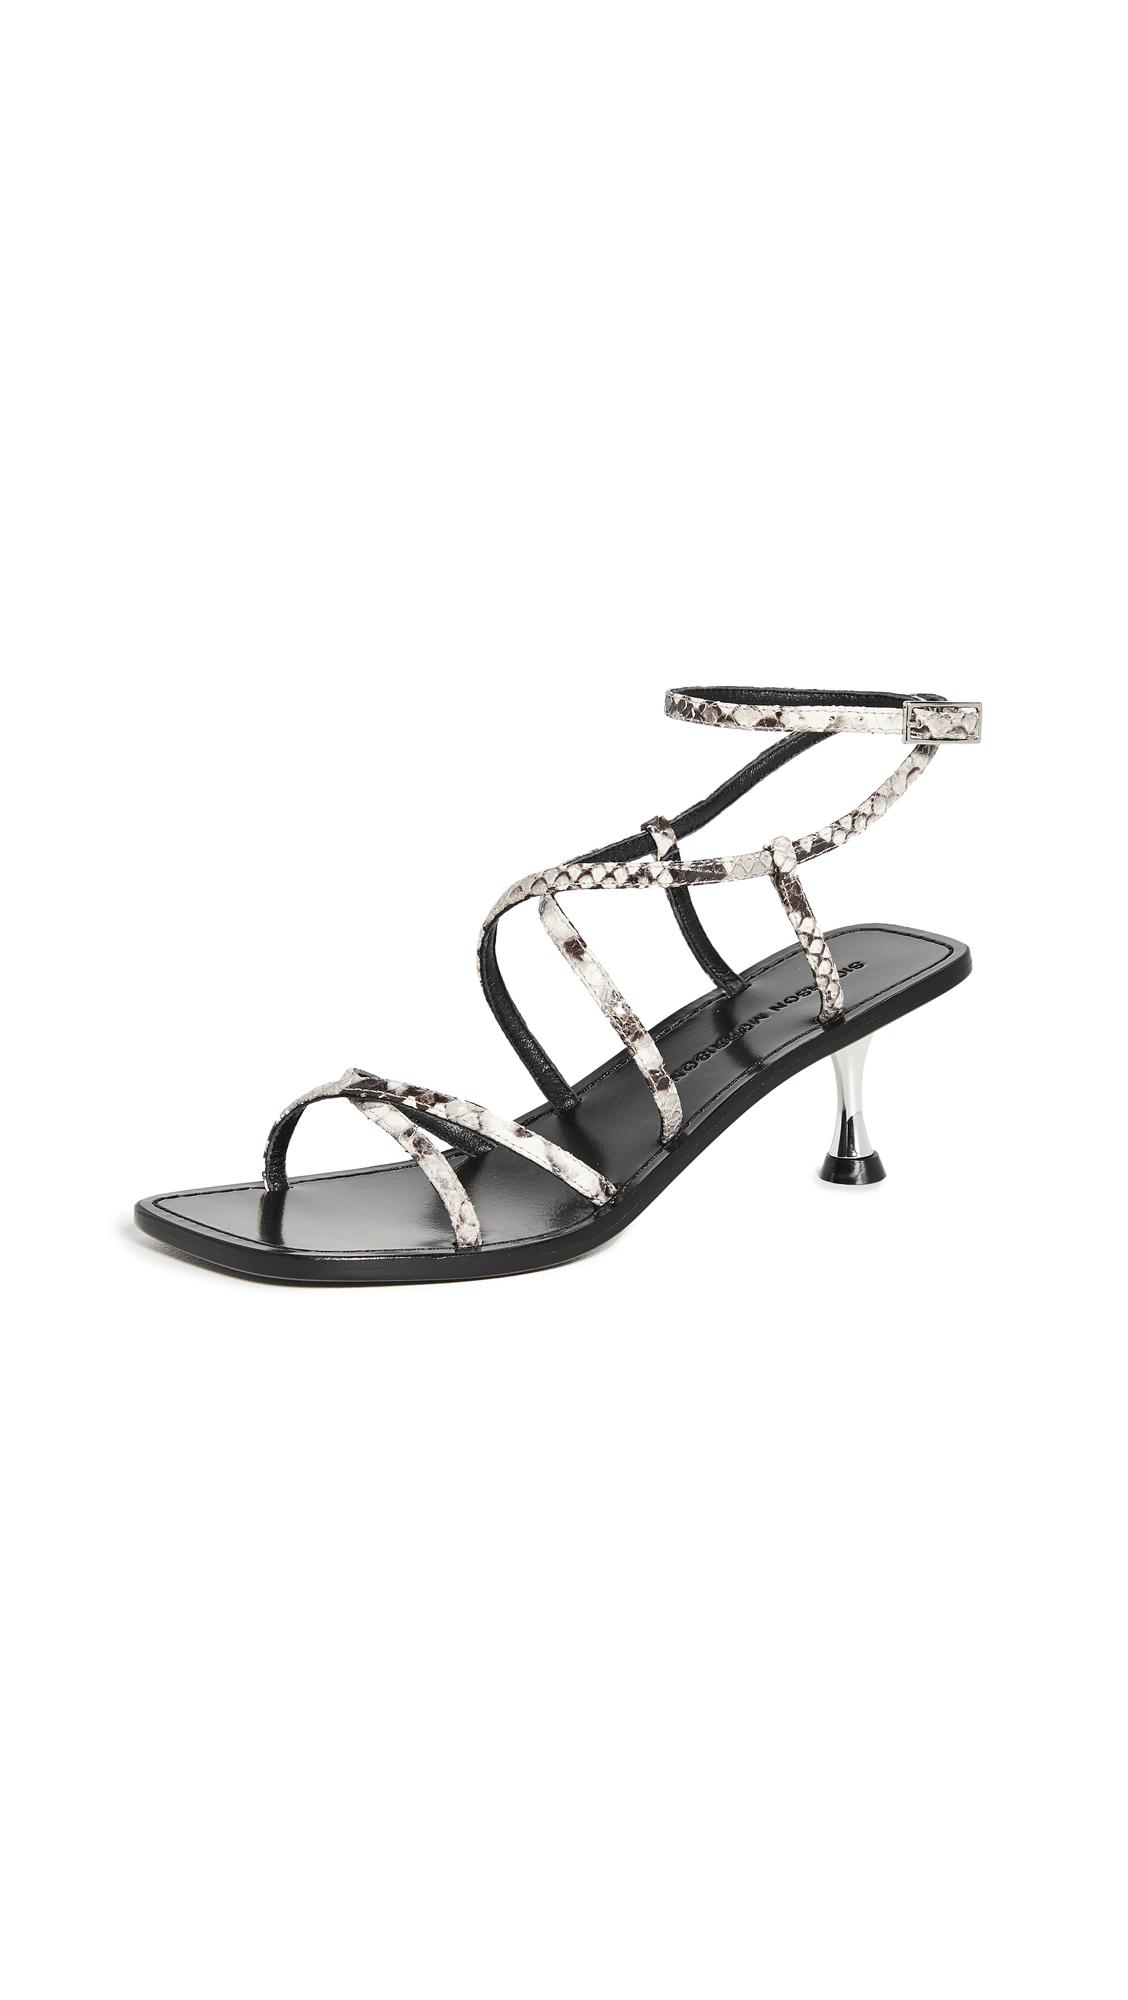 Buy Sigerson Morrison Irma Sandals online, shop Sigerson Morrison